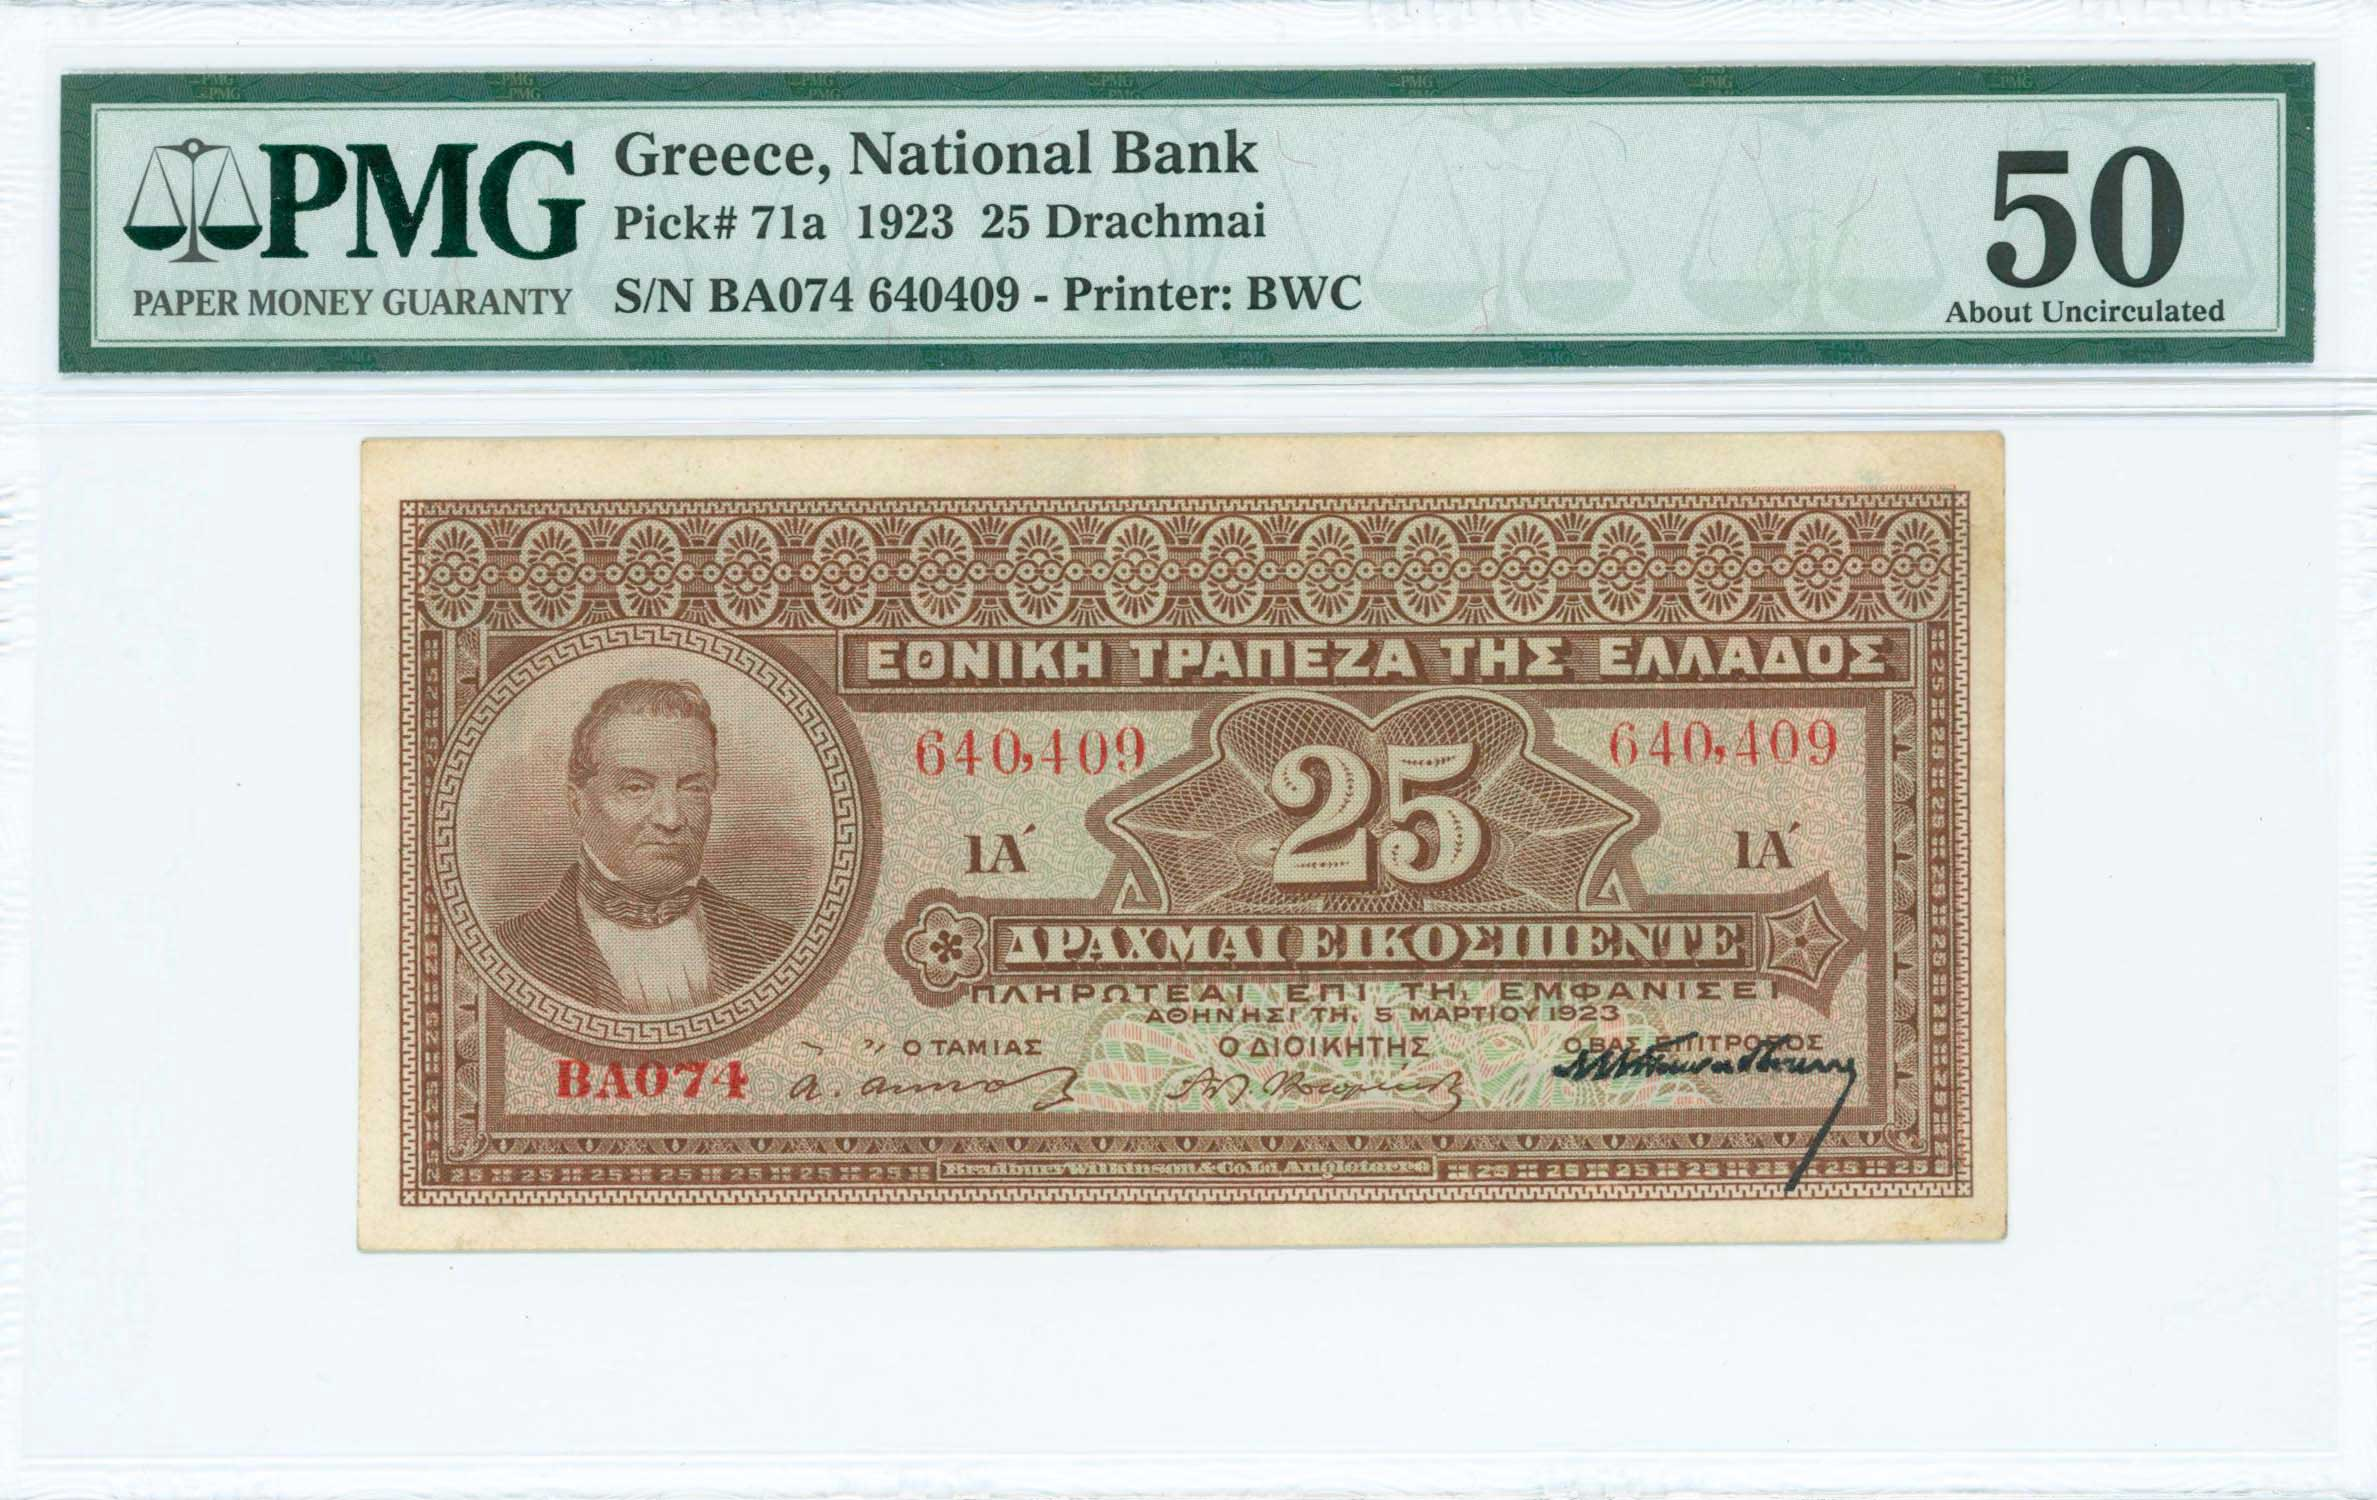 Lot 6397 - -  PAPER MONEY - BANKNOTES National Bank of Greece -  A. Karamitsos Public Auction 655